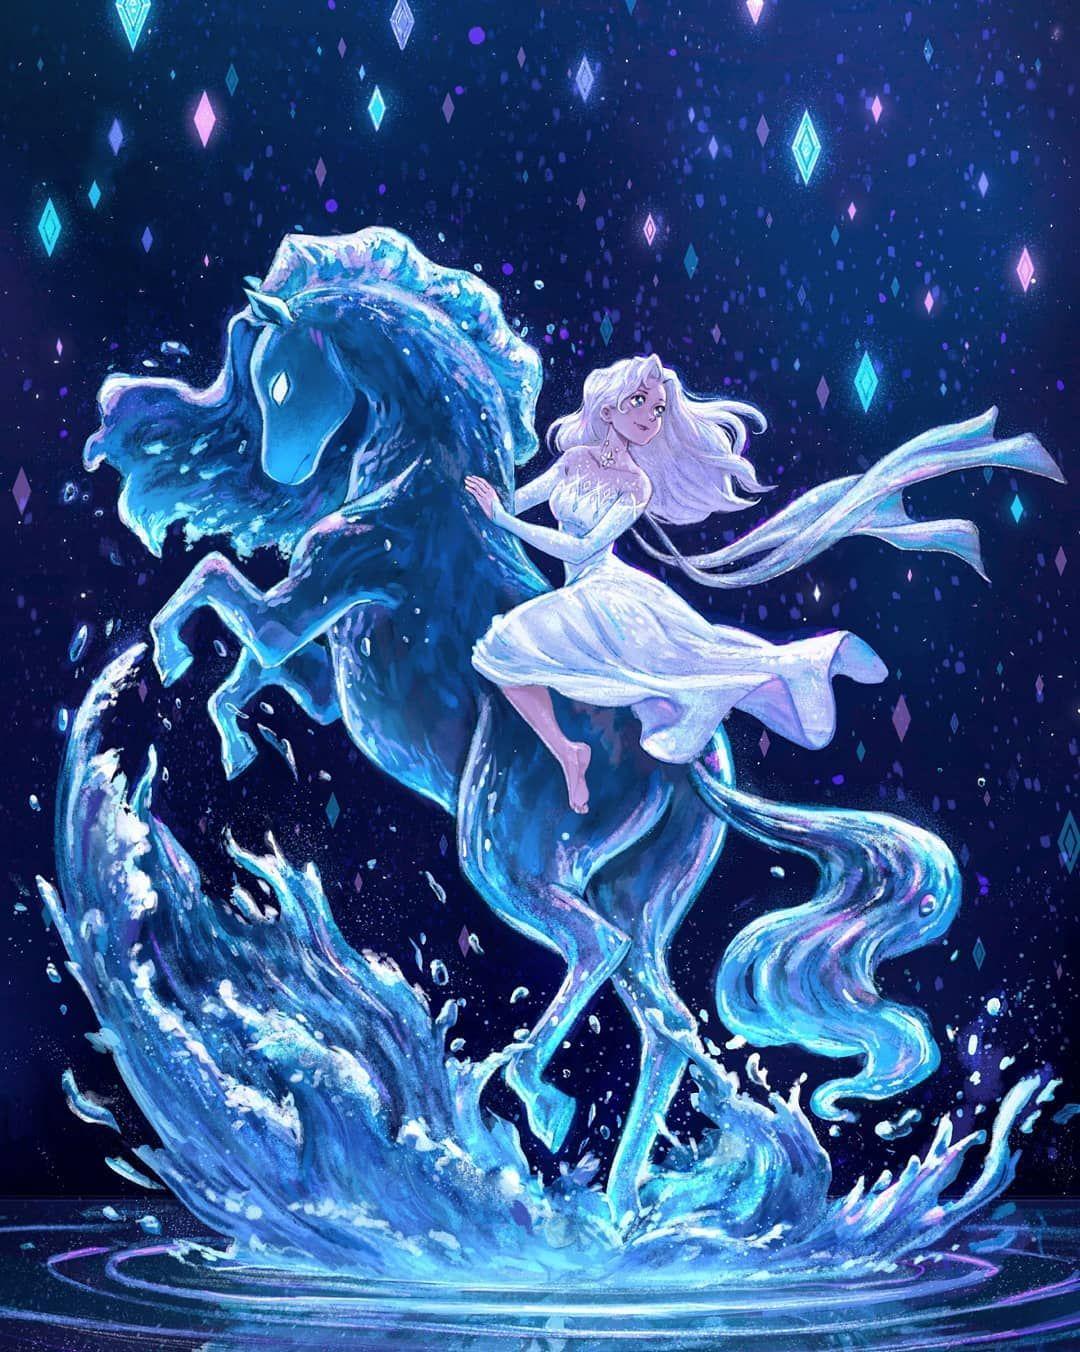 16 4k Likes 58 Comments Gonji Gogo Gonji On Instagram Frozen 2 Fanart The Moment Disney Princess Art Frozen Disney Movie Disney Princess Wallpaper